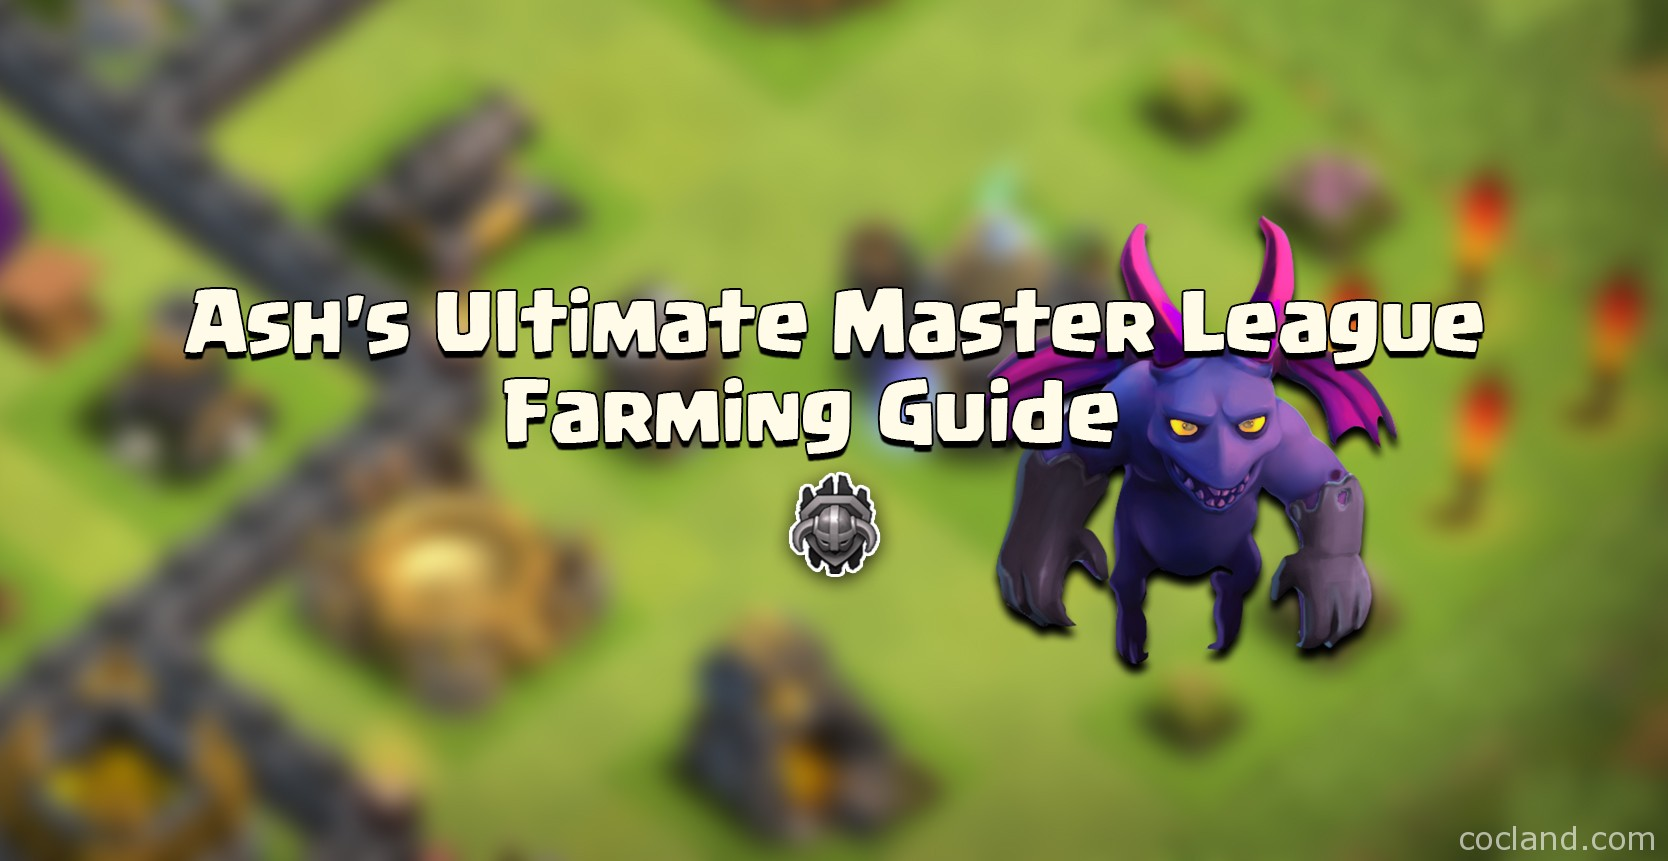 Master League Farmnig Guide by Ash